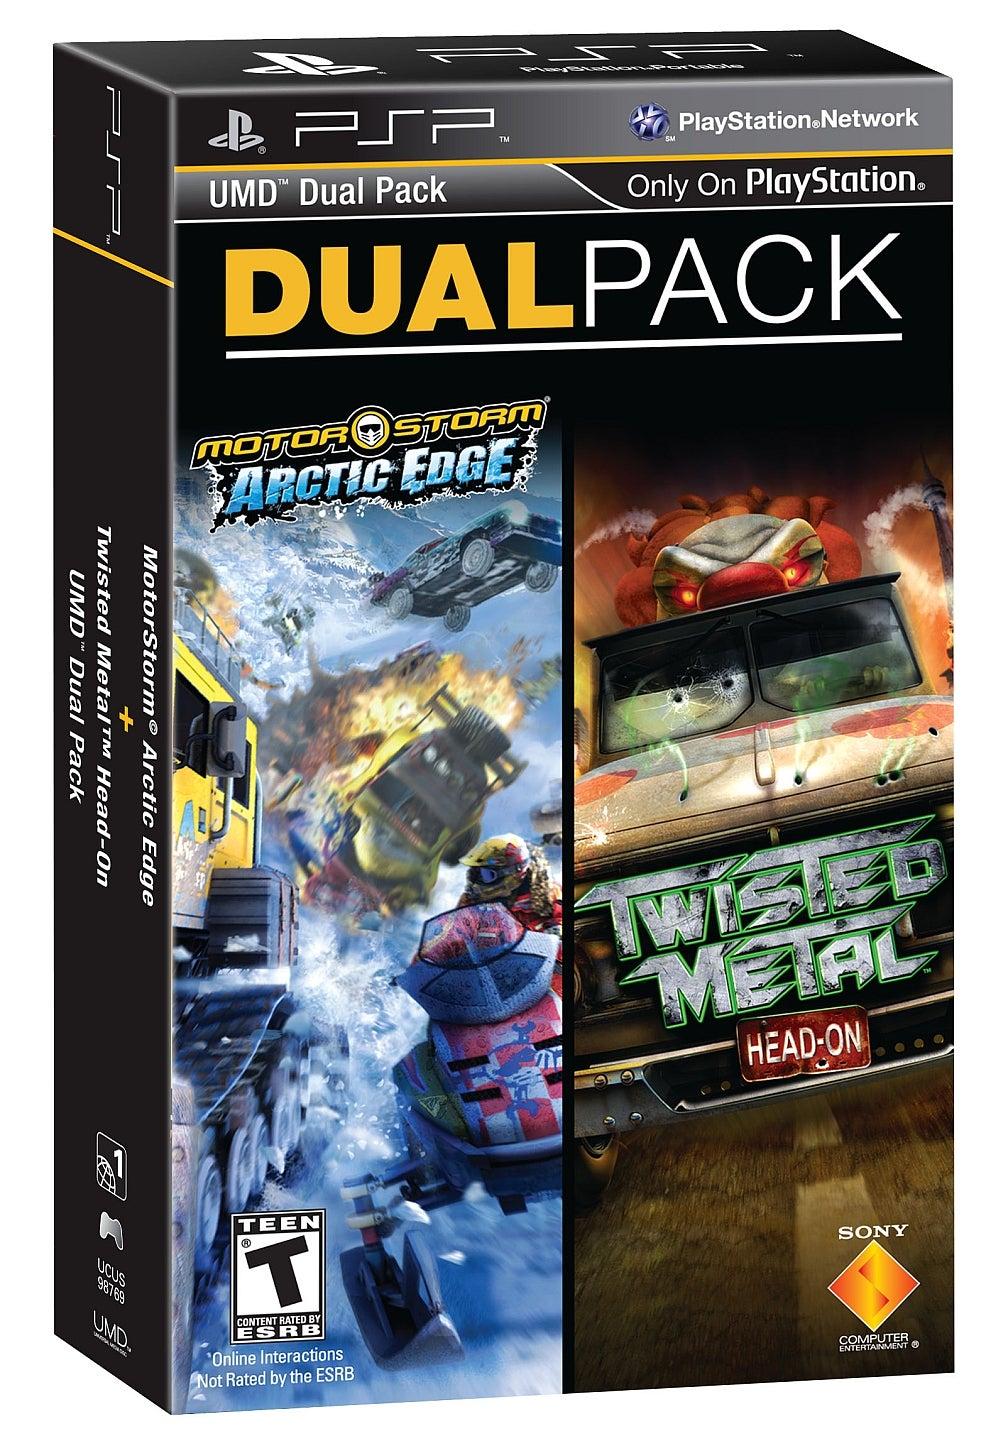 Dual Pack Motorstorm Arctic Edge Amp Twisted Metal Head On PlayStation Portable IGN